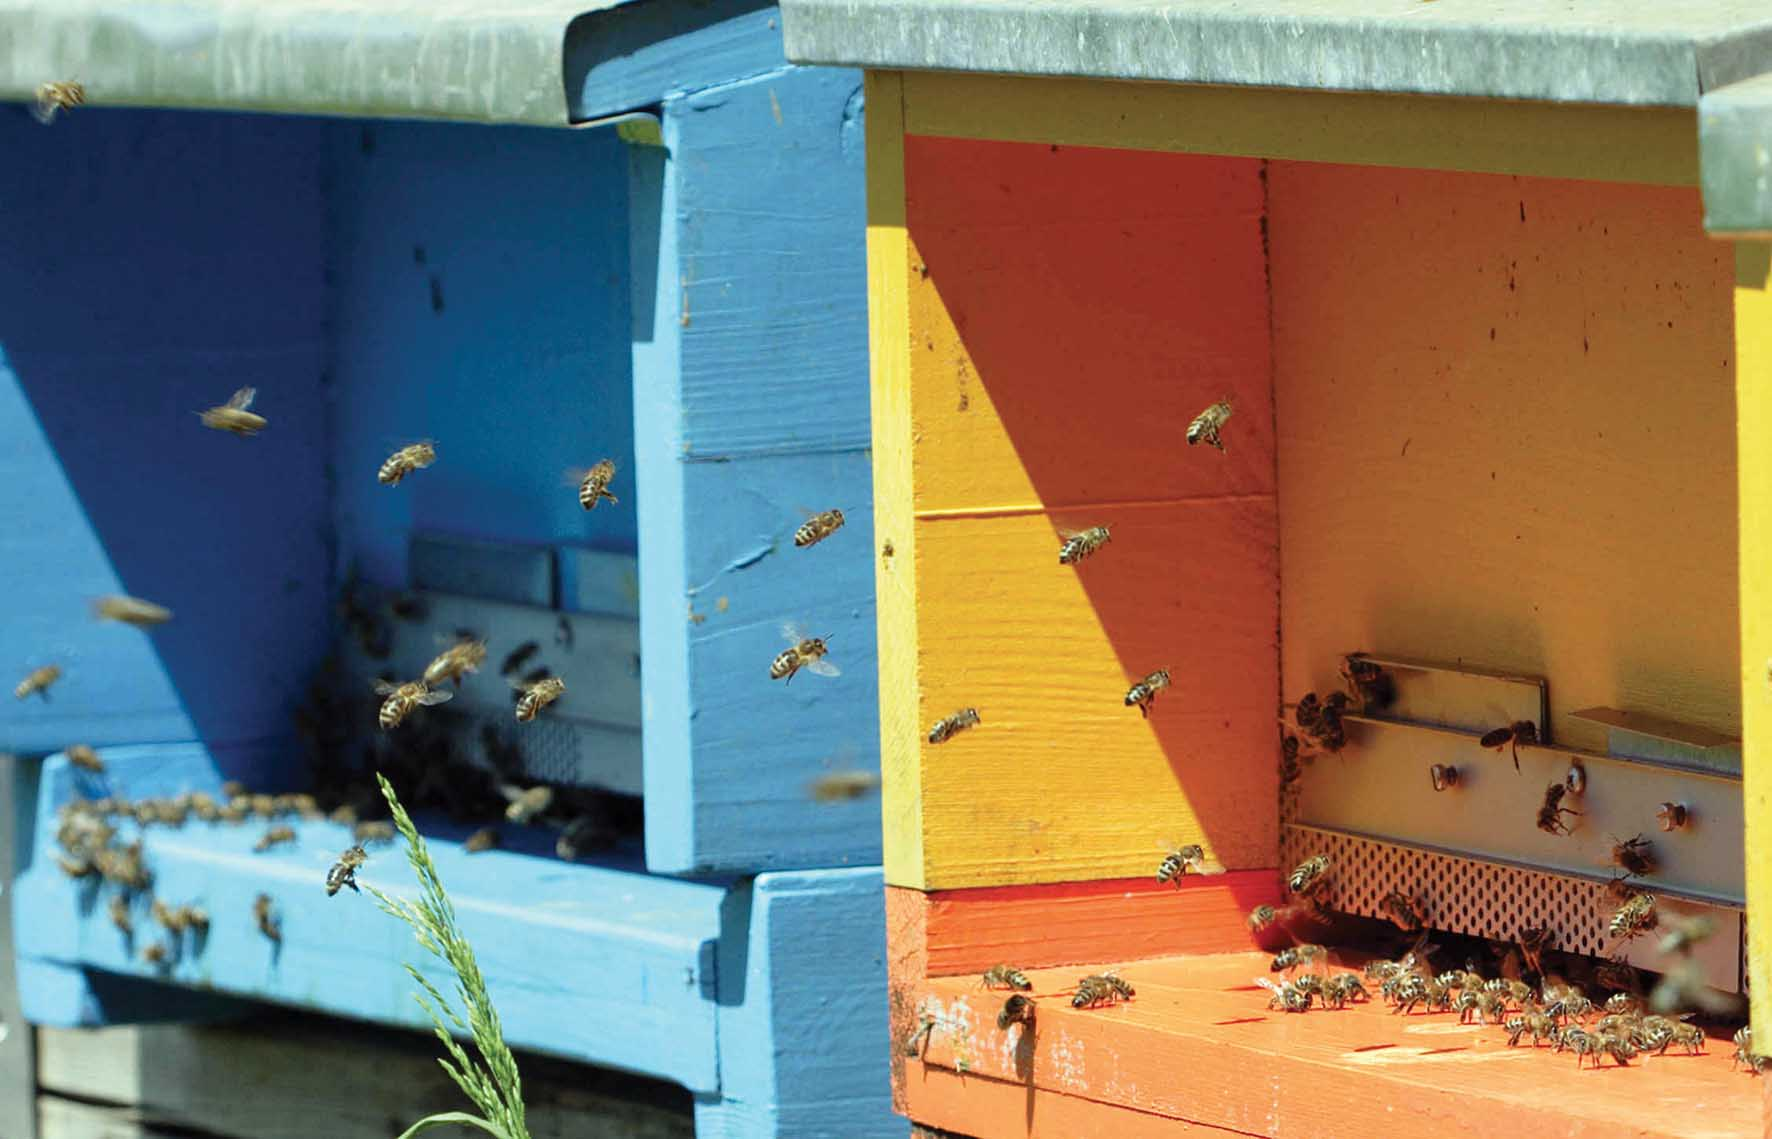 apicoltura sciame api alveare